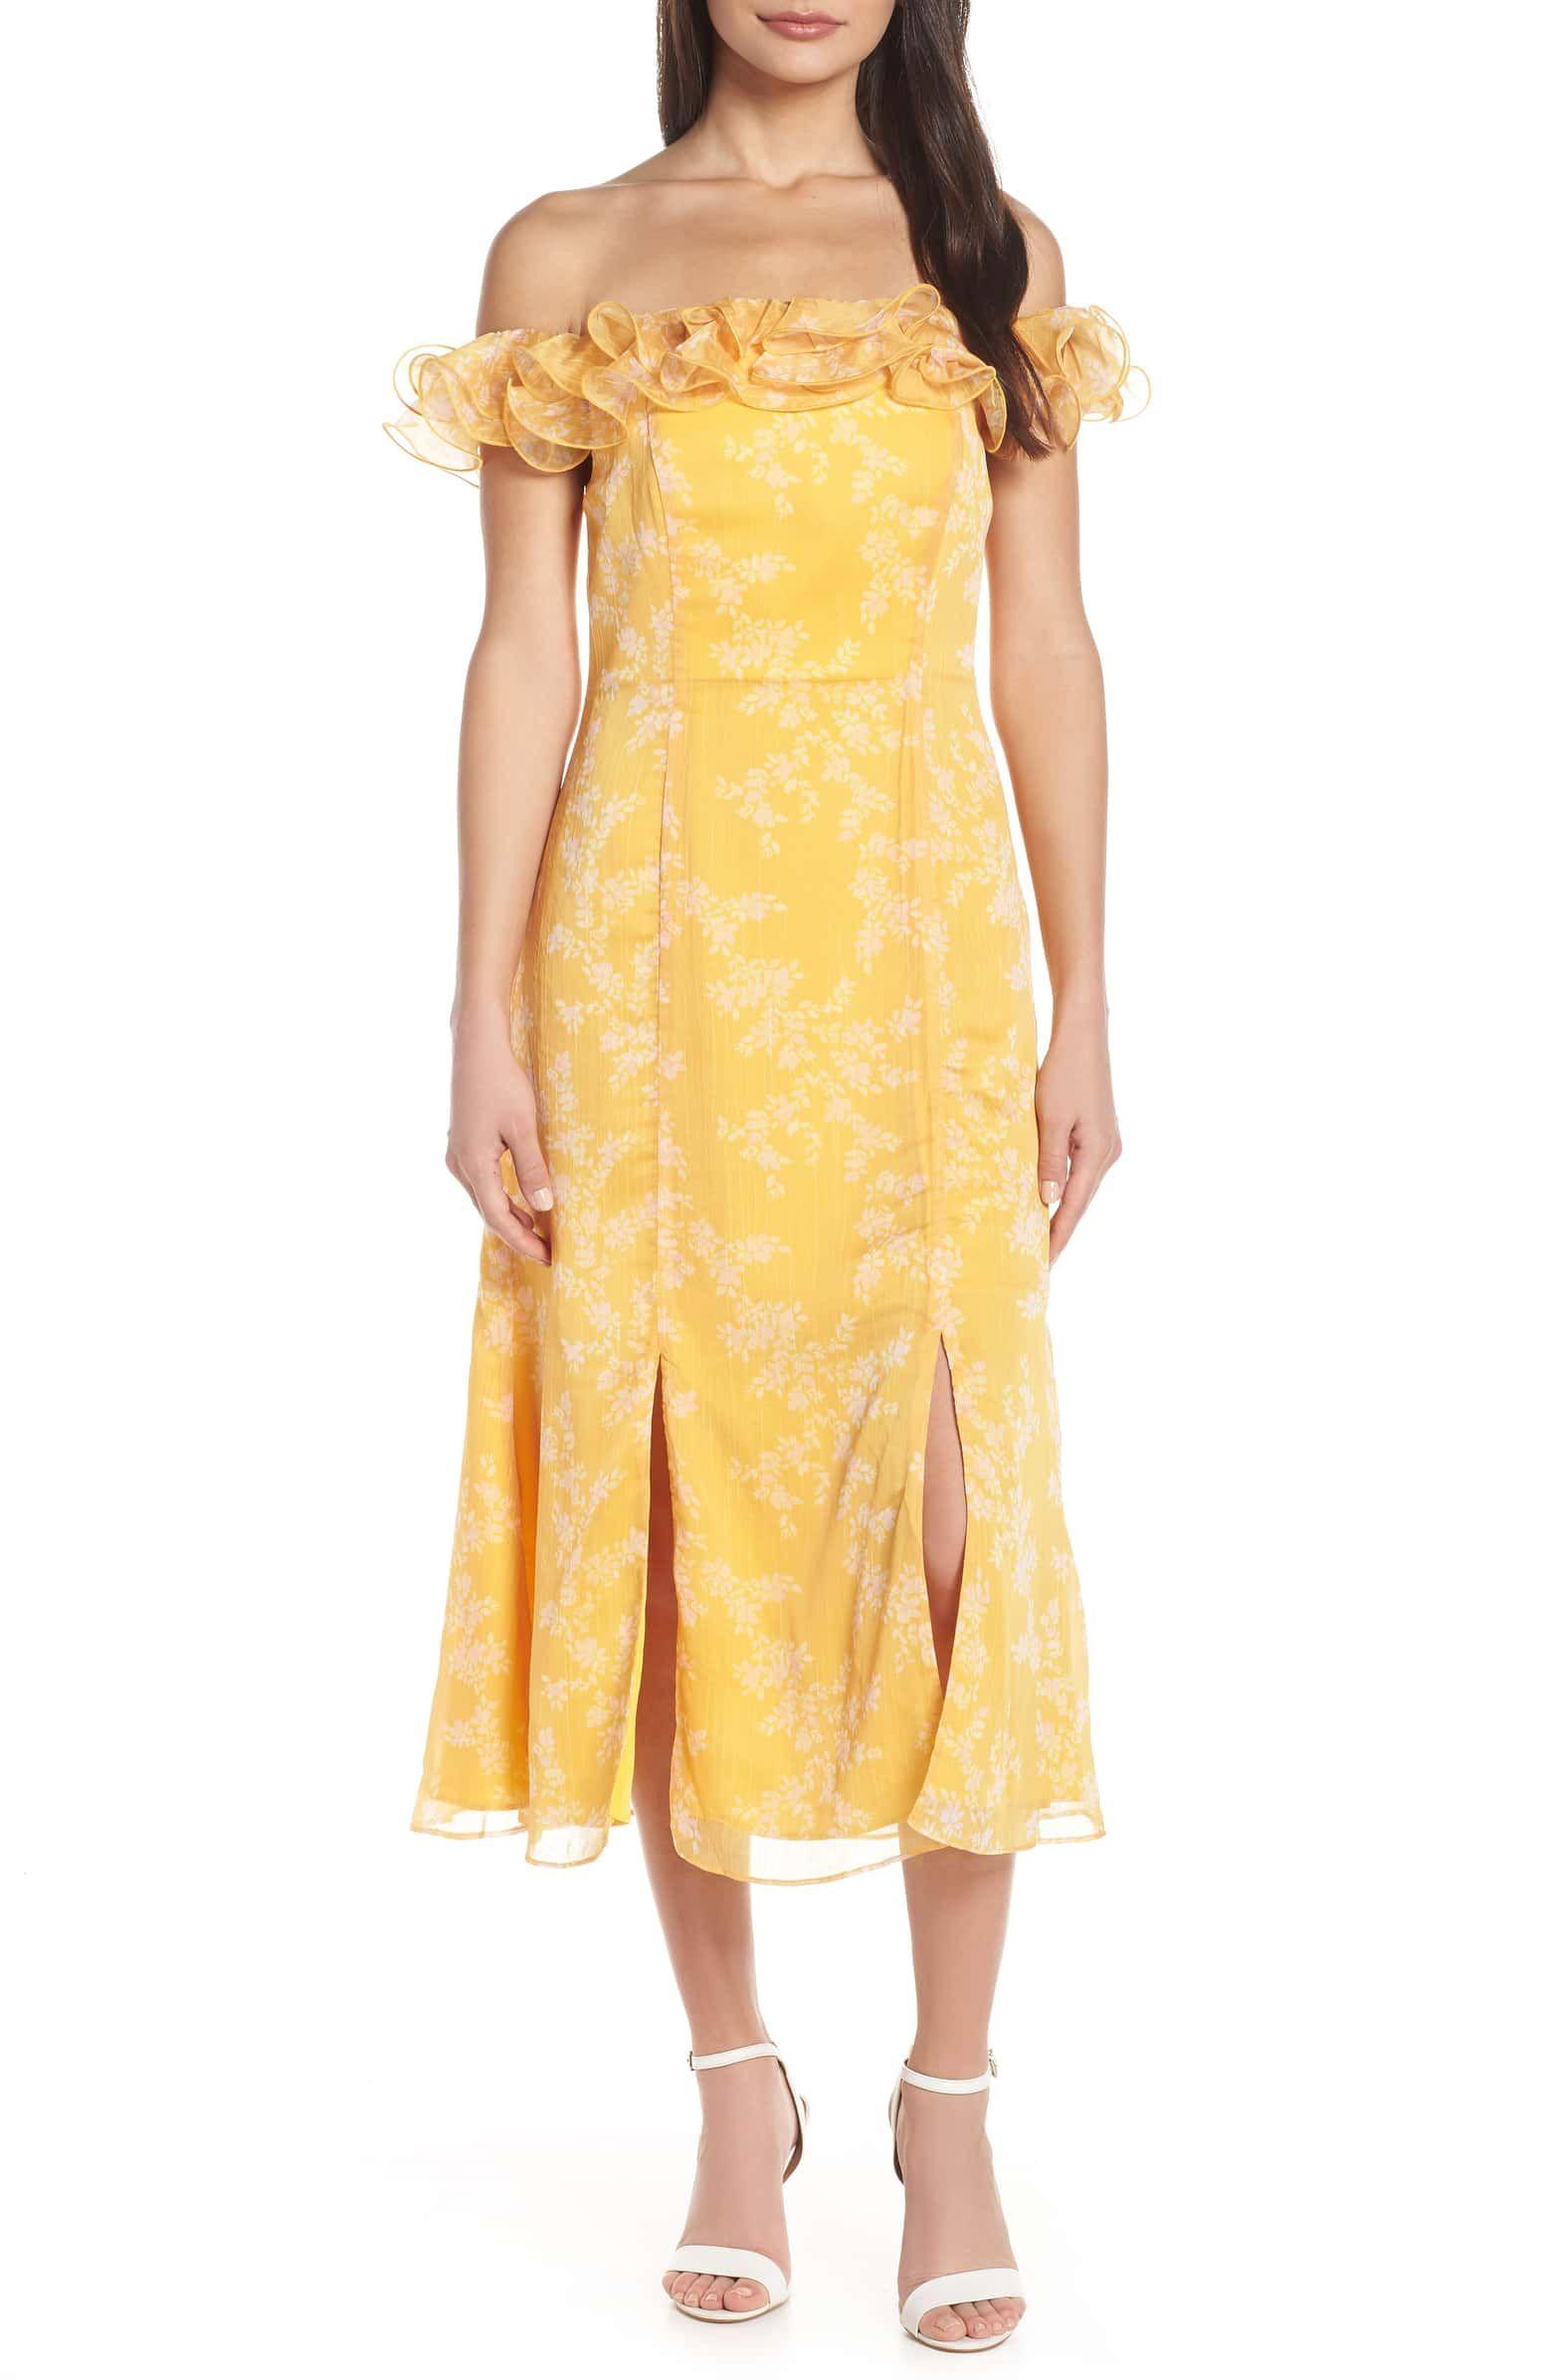 Embrace Ruffled Off The Shoulder Midi Dress Main Color Golden Floral Fashion Clothes Women Nordstrom Dresses Cocktail Dress Lace